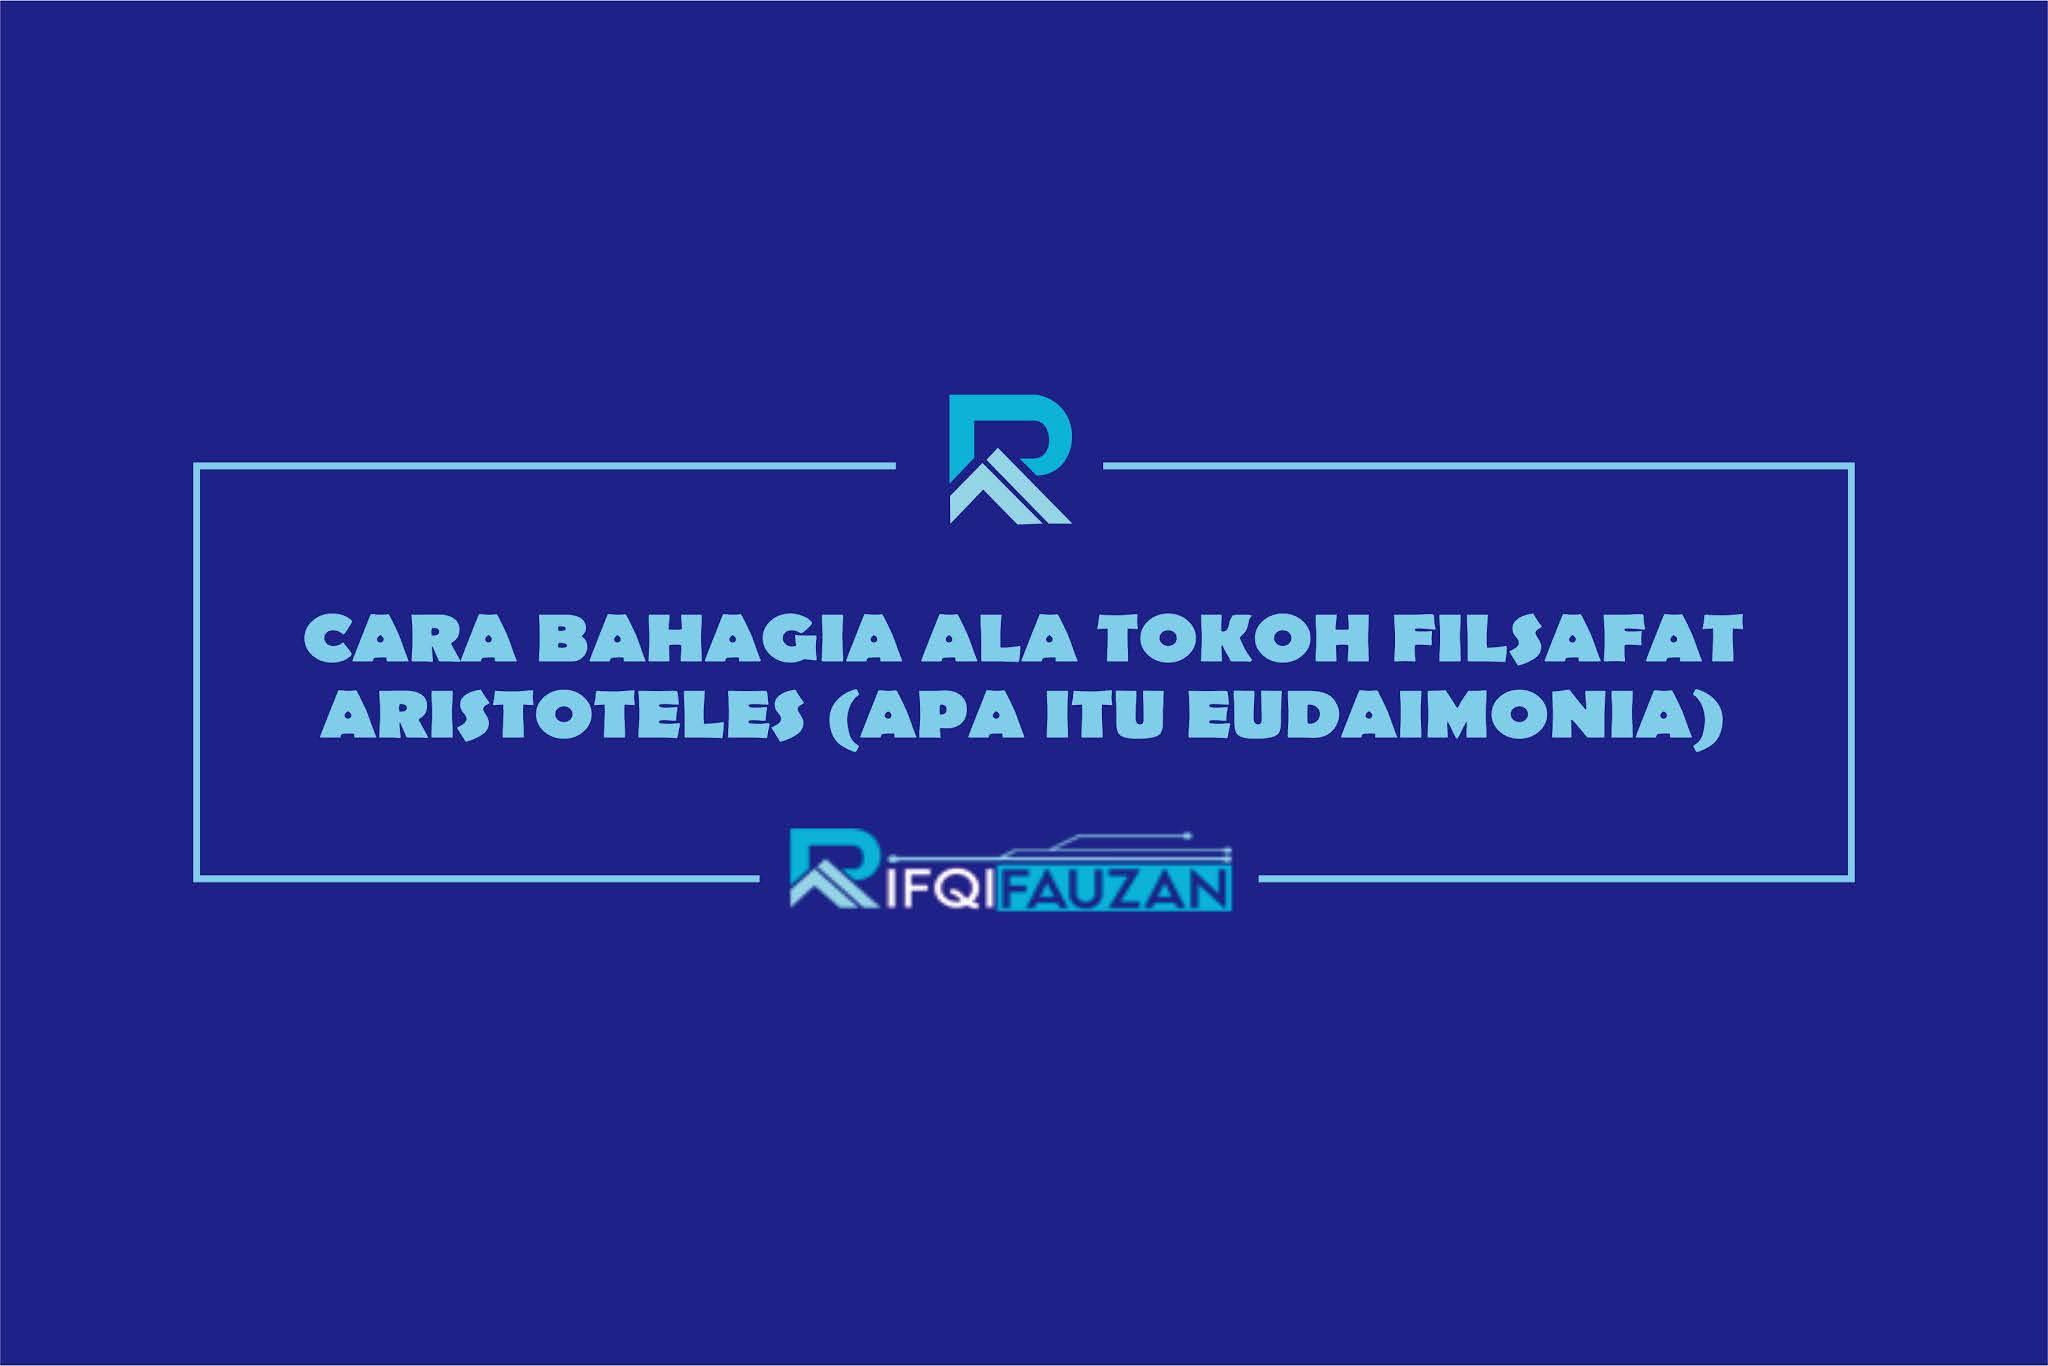 CARA BAHAGIA ALA TOKOH FILSAFAT ARISTOTELES (APA ITU EUDAIMONIA)